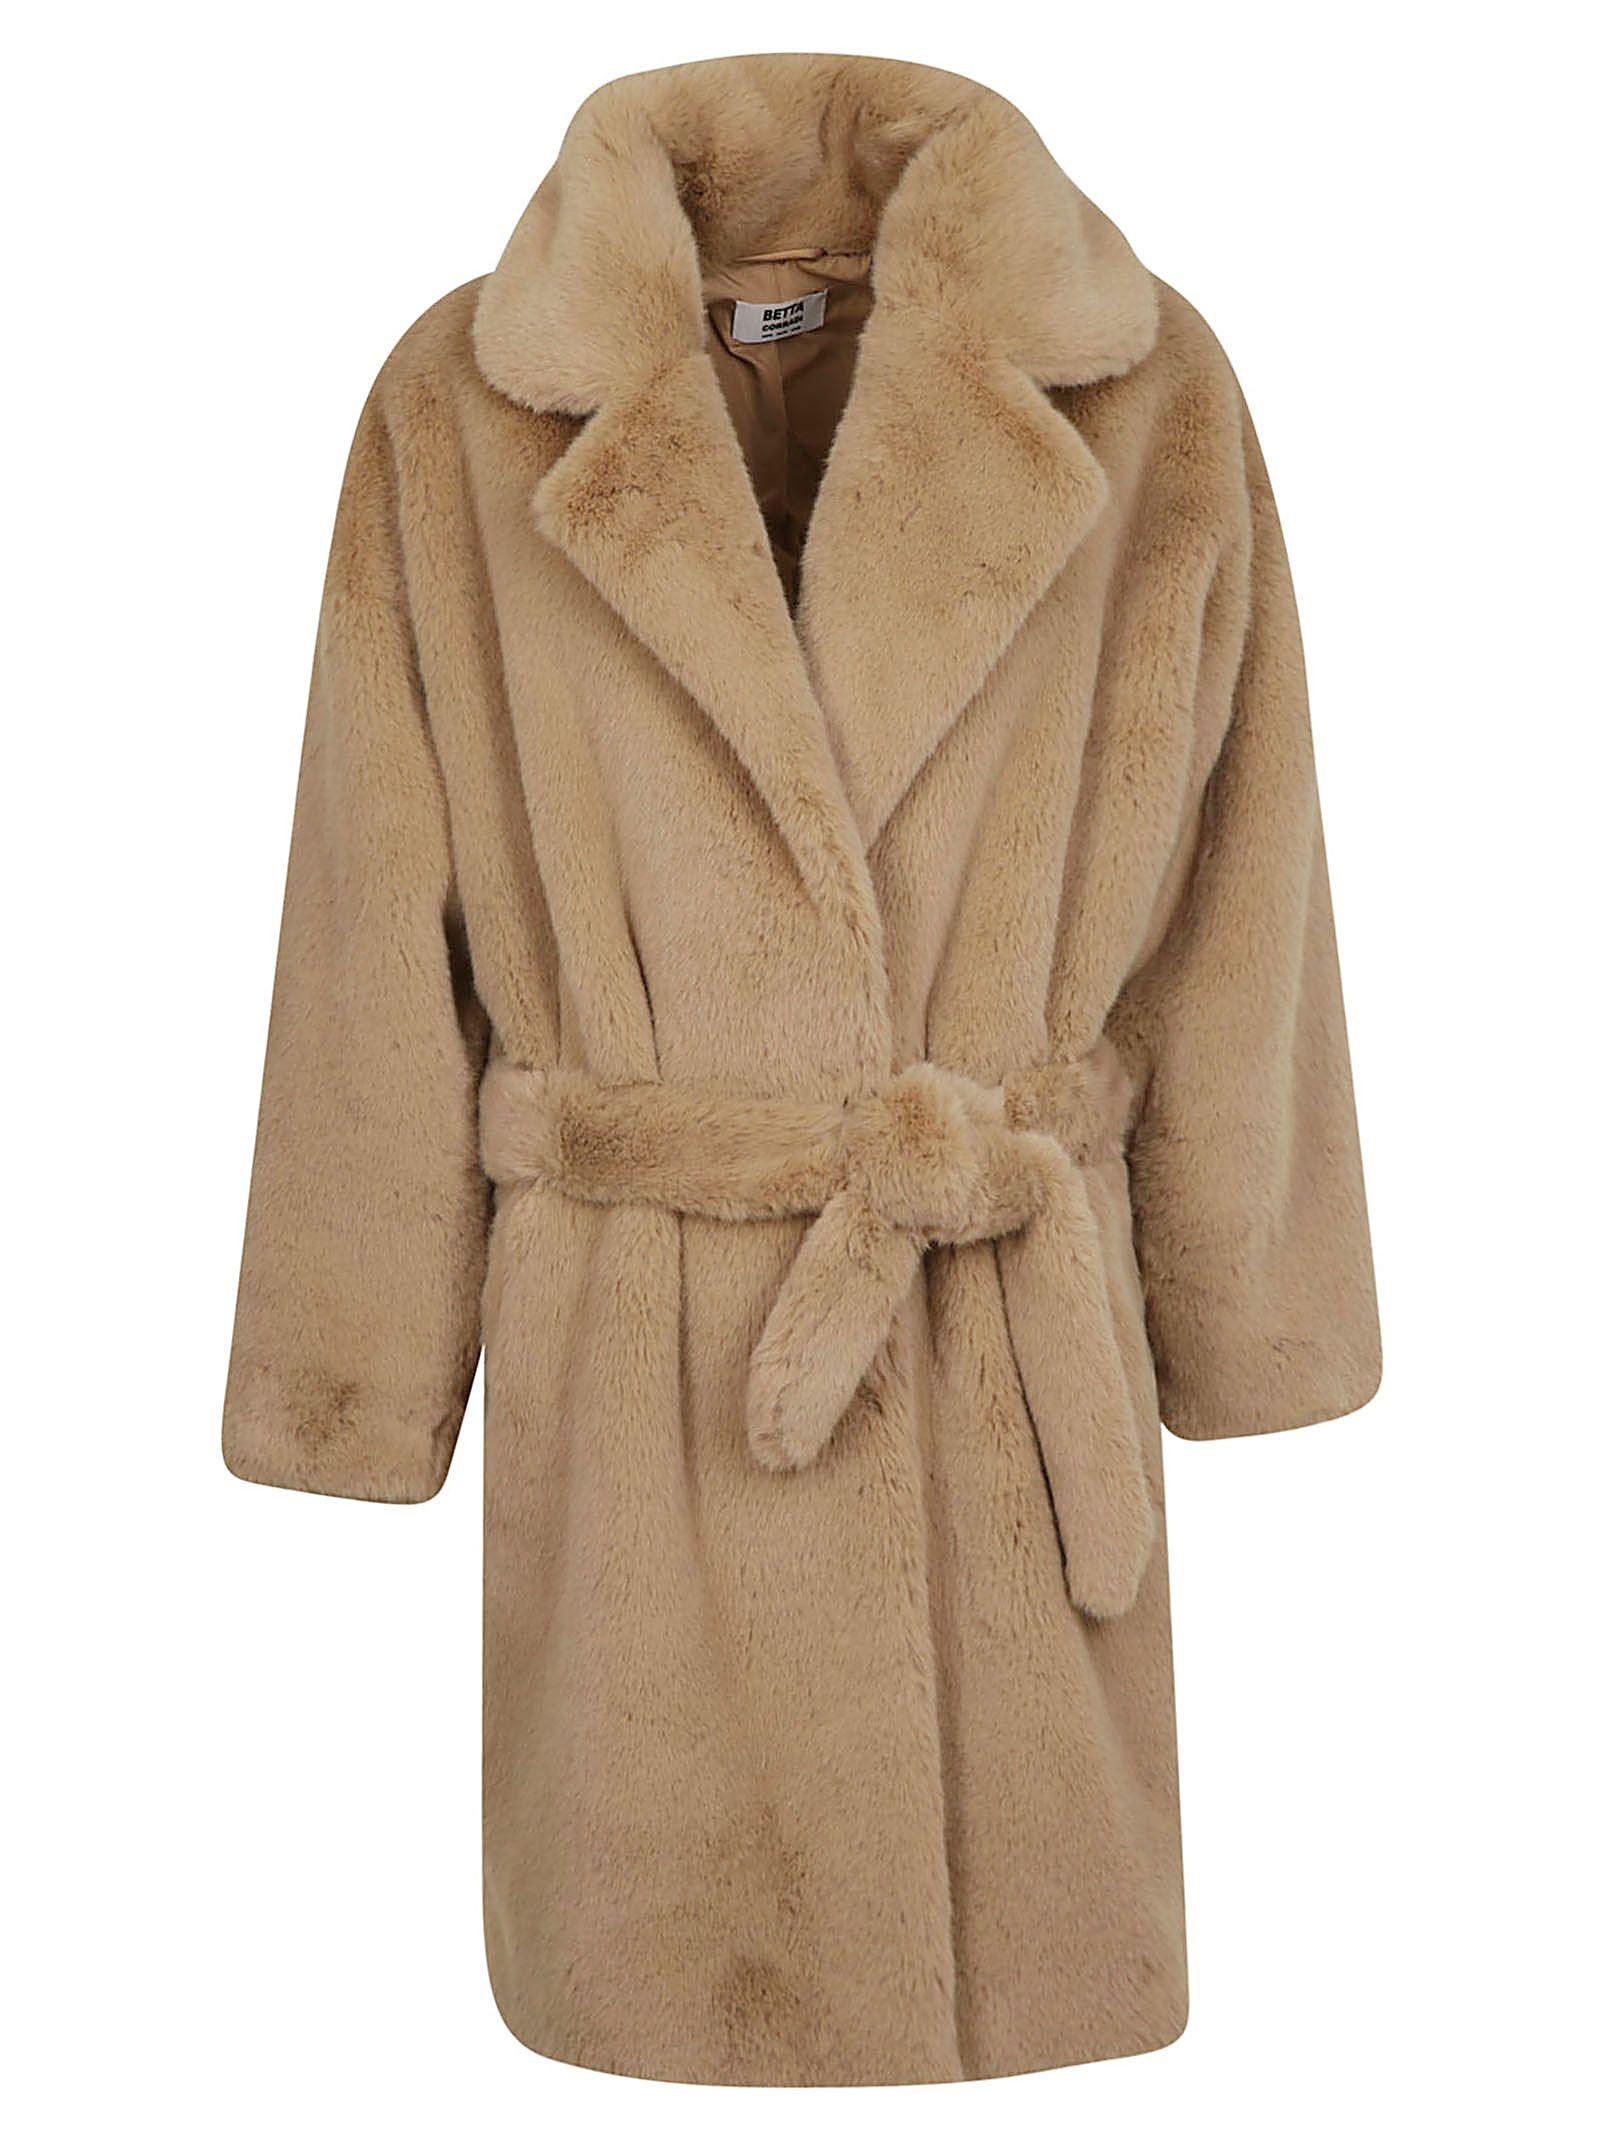 BETTA CORRADI Belted Coat in Cammello